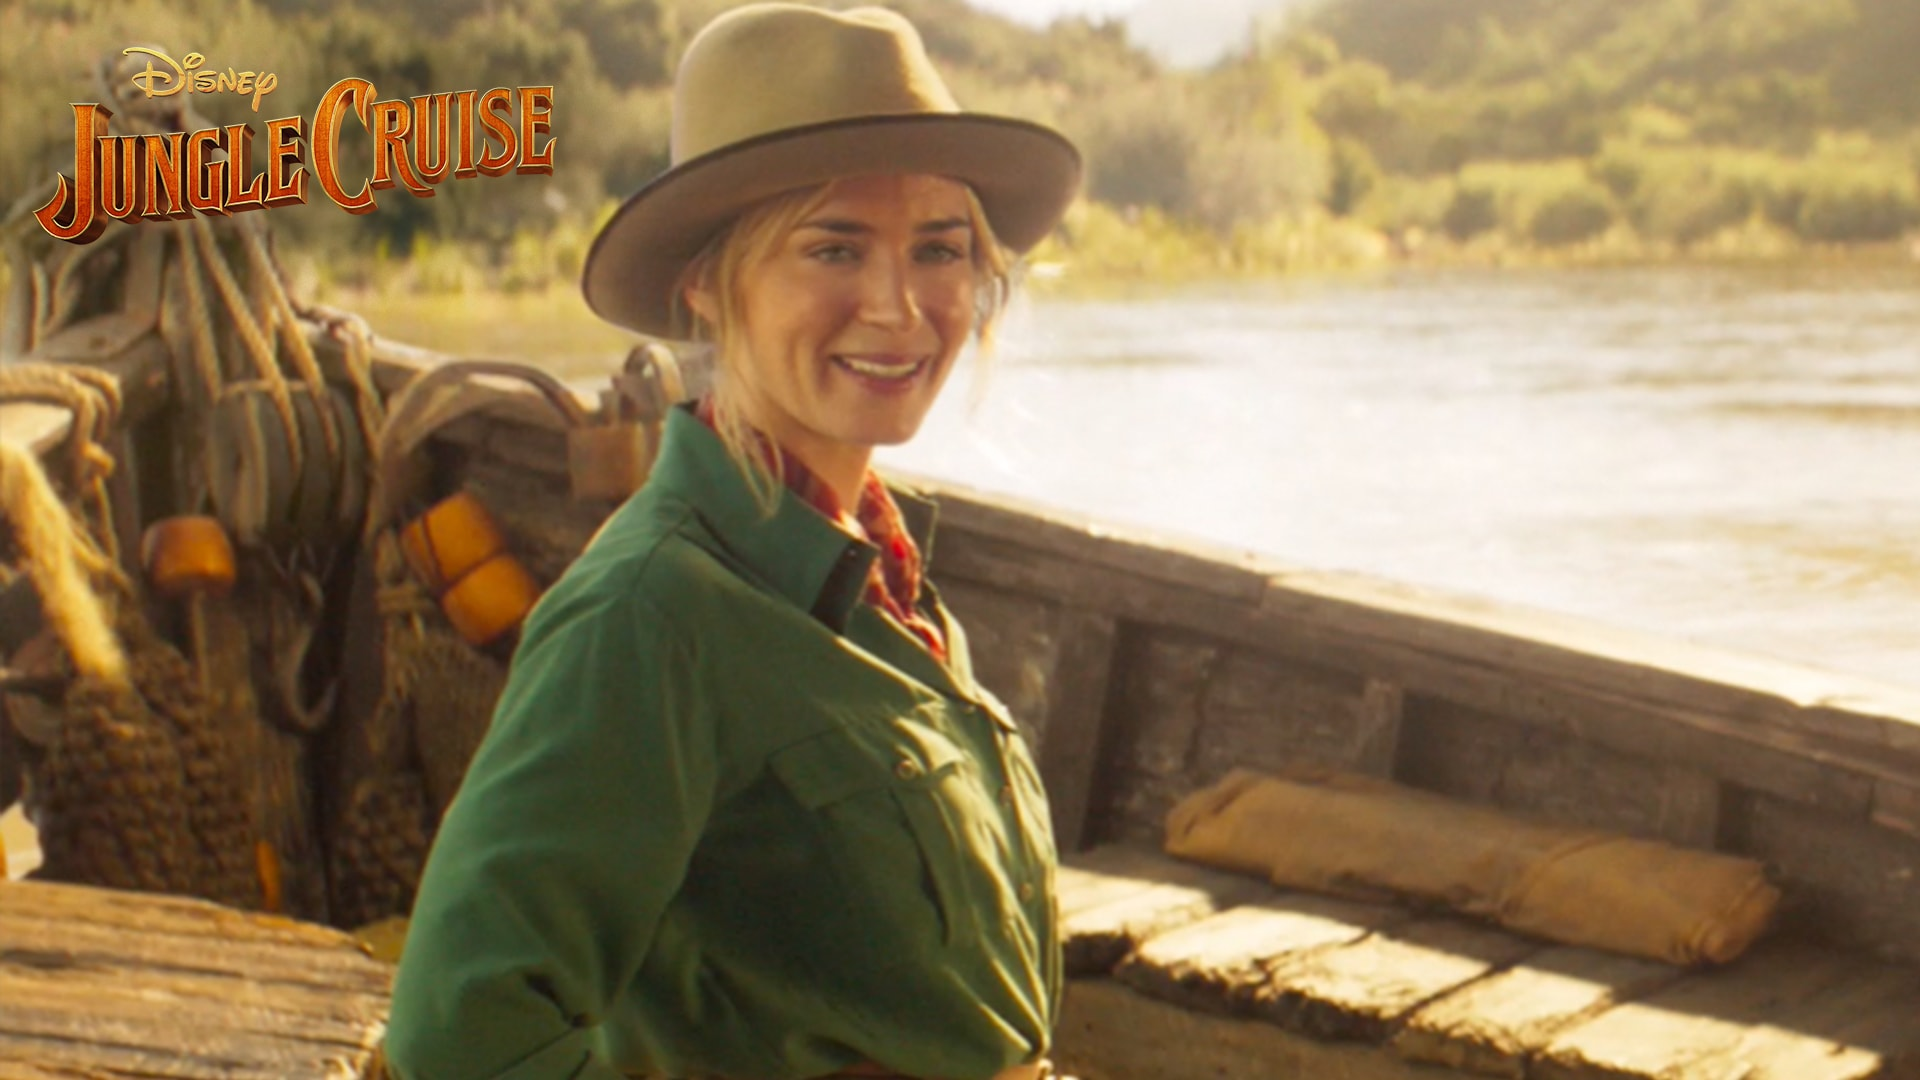 Arrow | Disney's Jungle Cruise | Experience it July 30